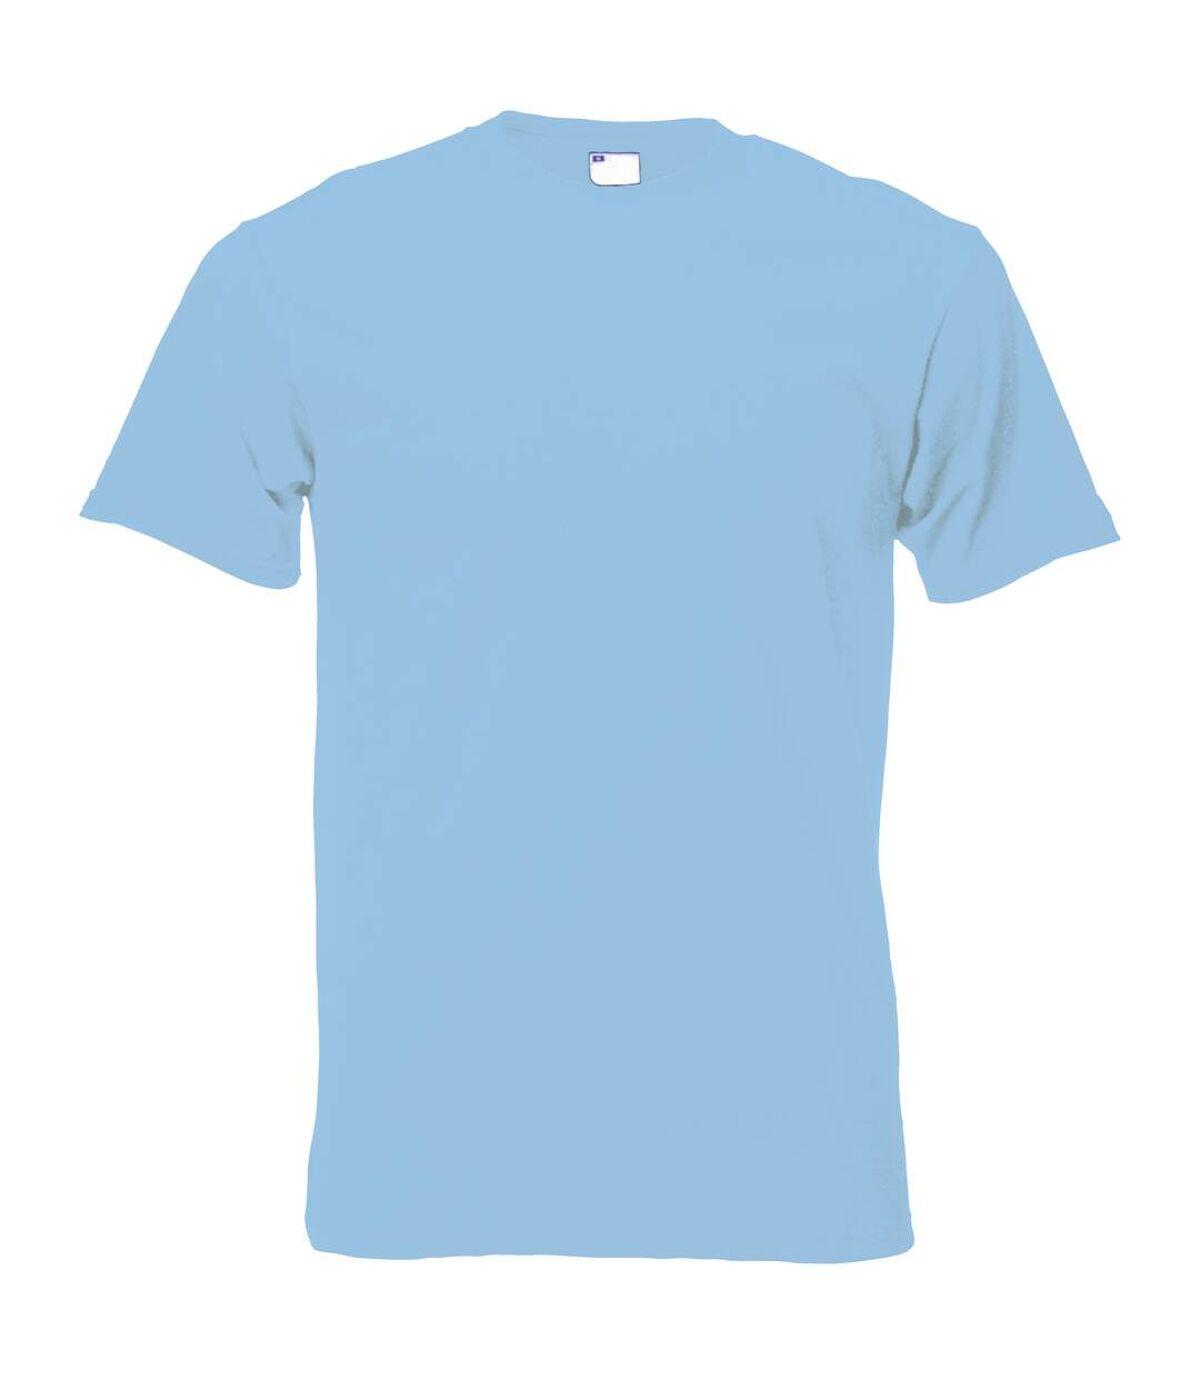 Mens Short Sleeve Casual T-Shirt (Bright Yellow) - UTBC3904